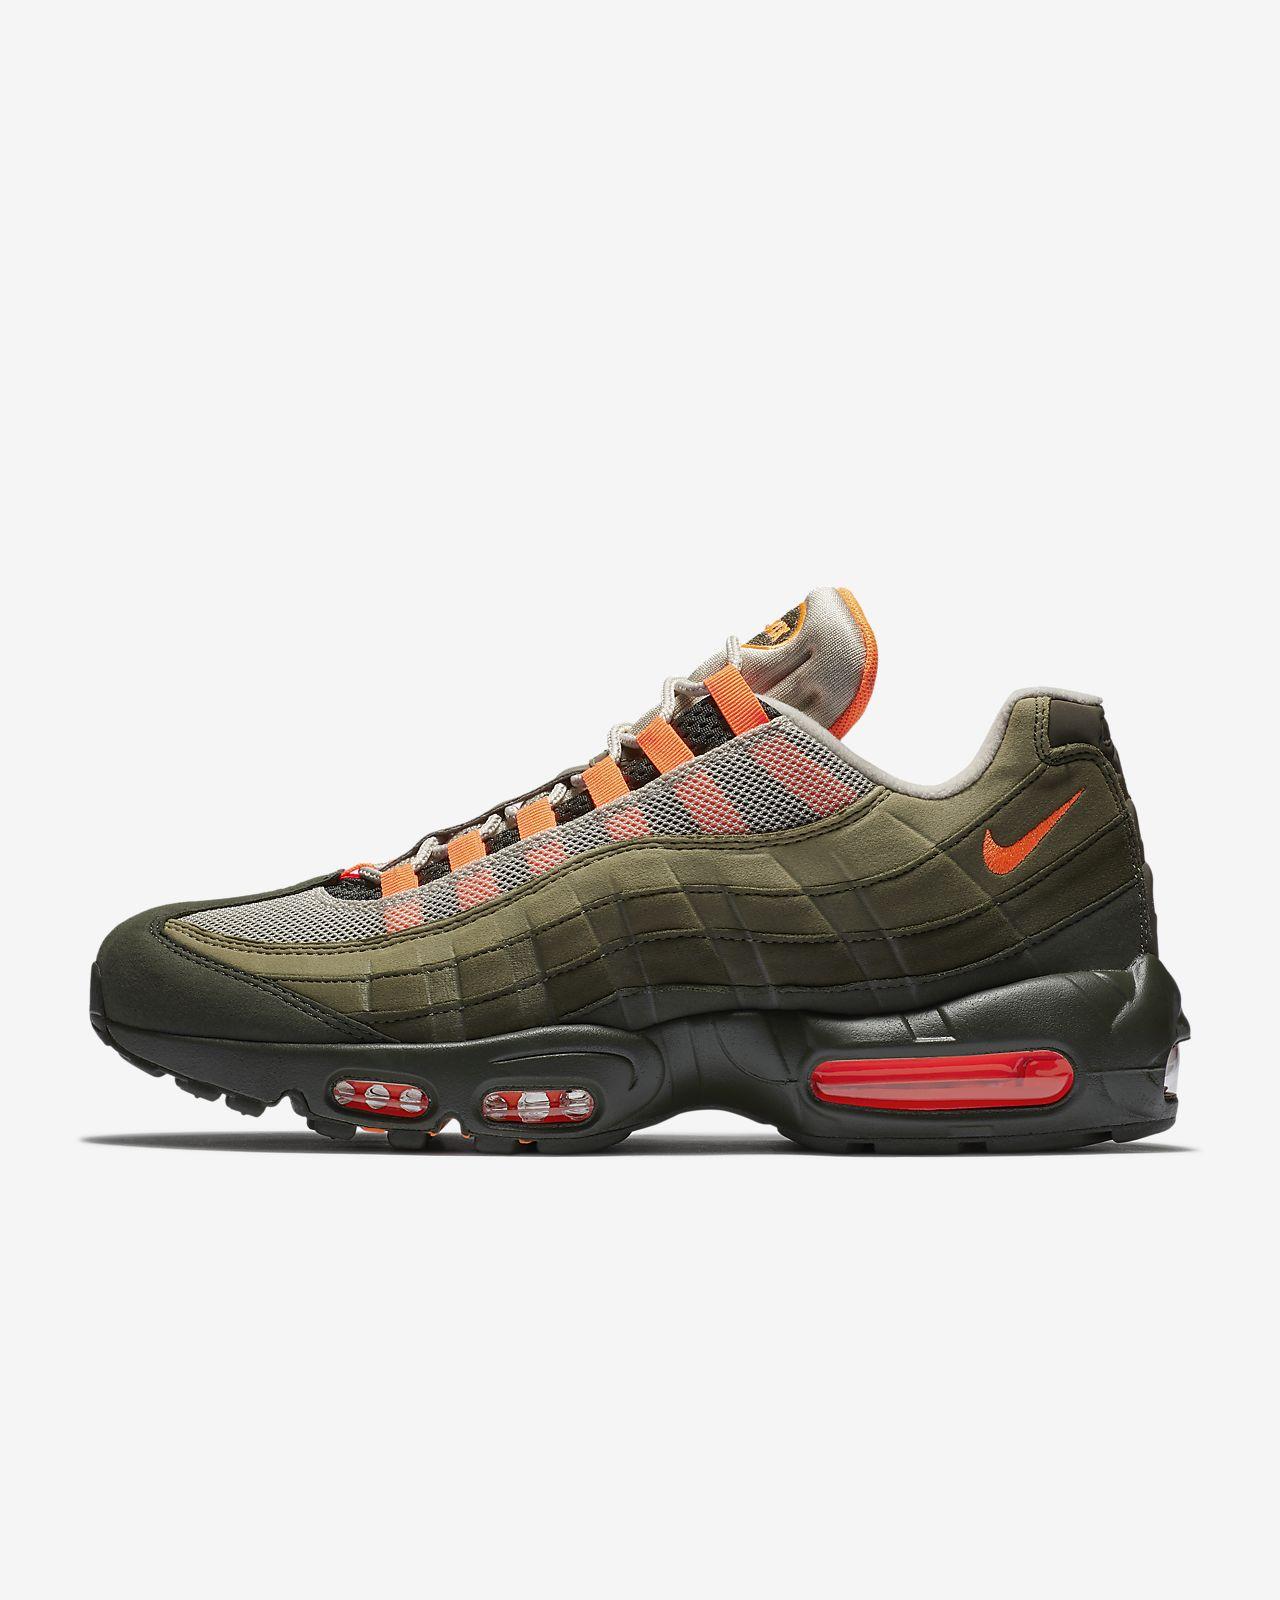 sports shoes 9abb0 e37ee closeout nike air max 95 stussy marron argent 5b9ab e607e